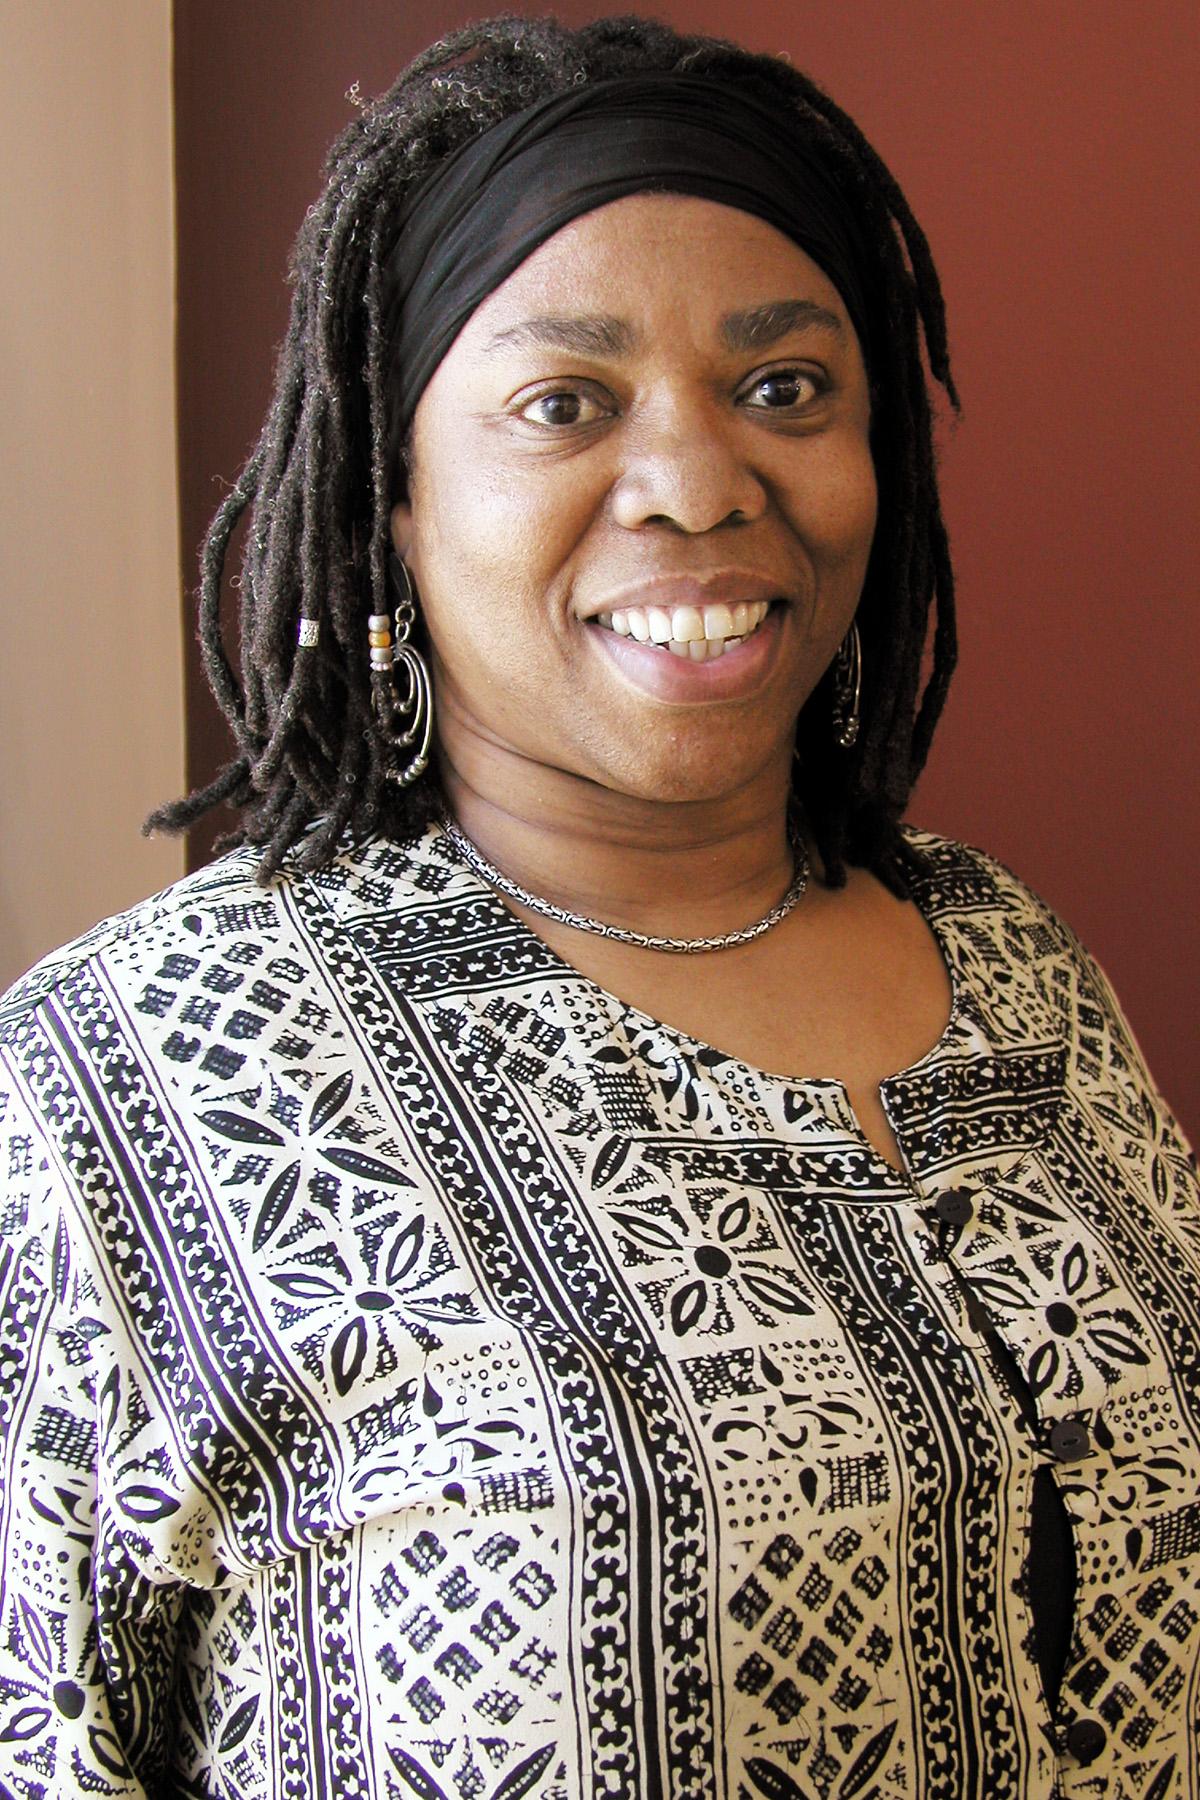 Debra S. Daniels